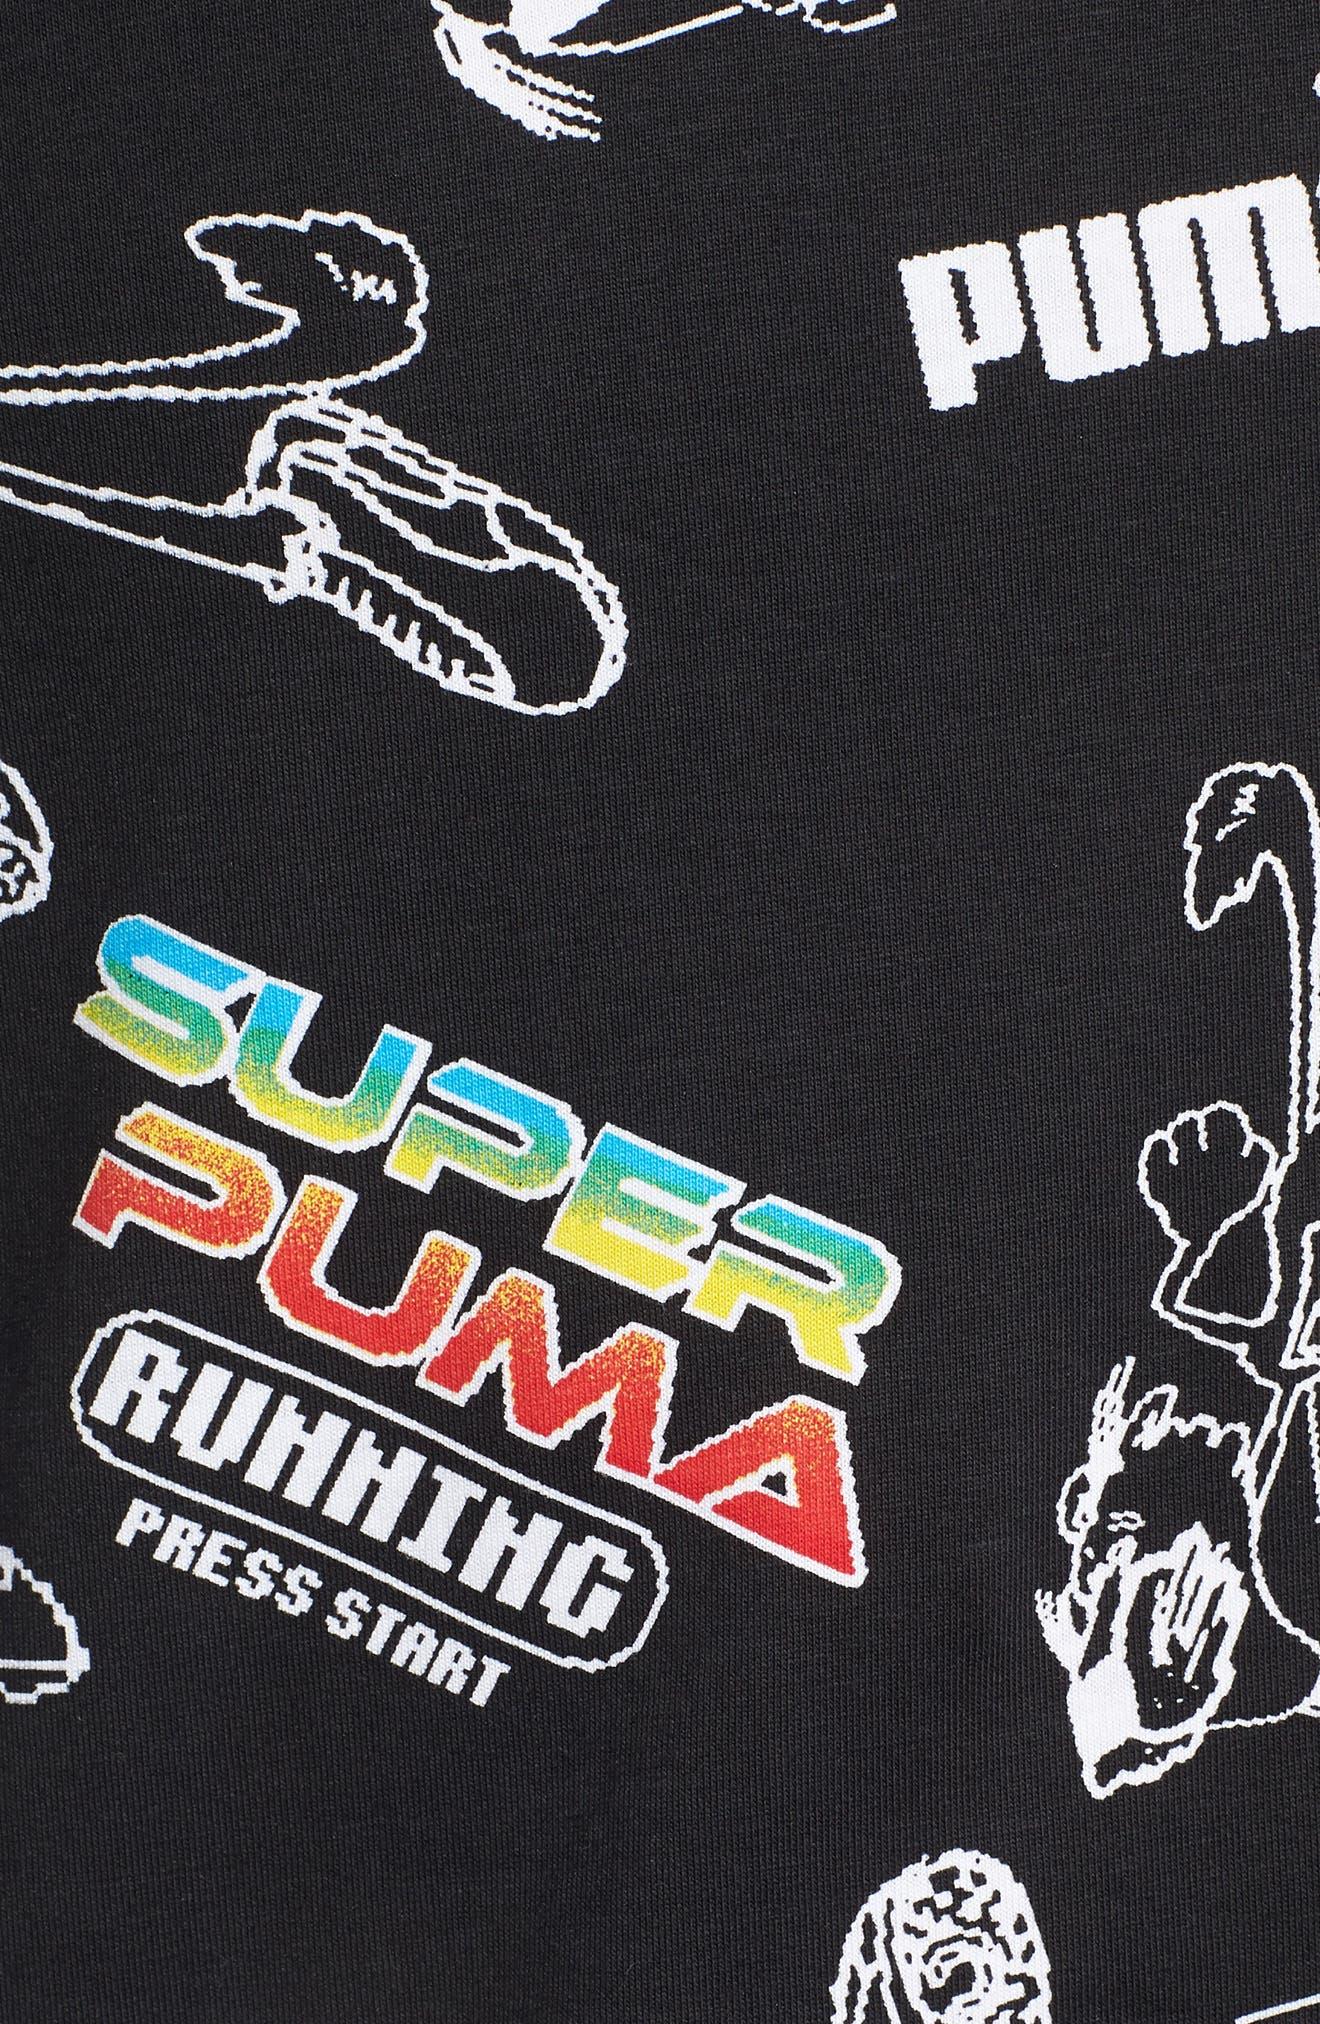 Super PUMA Regular Fit T-Shirt,                             Alternate thumbnail 5, color,                             COTTON BLACK